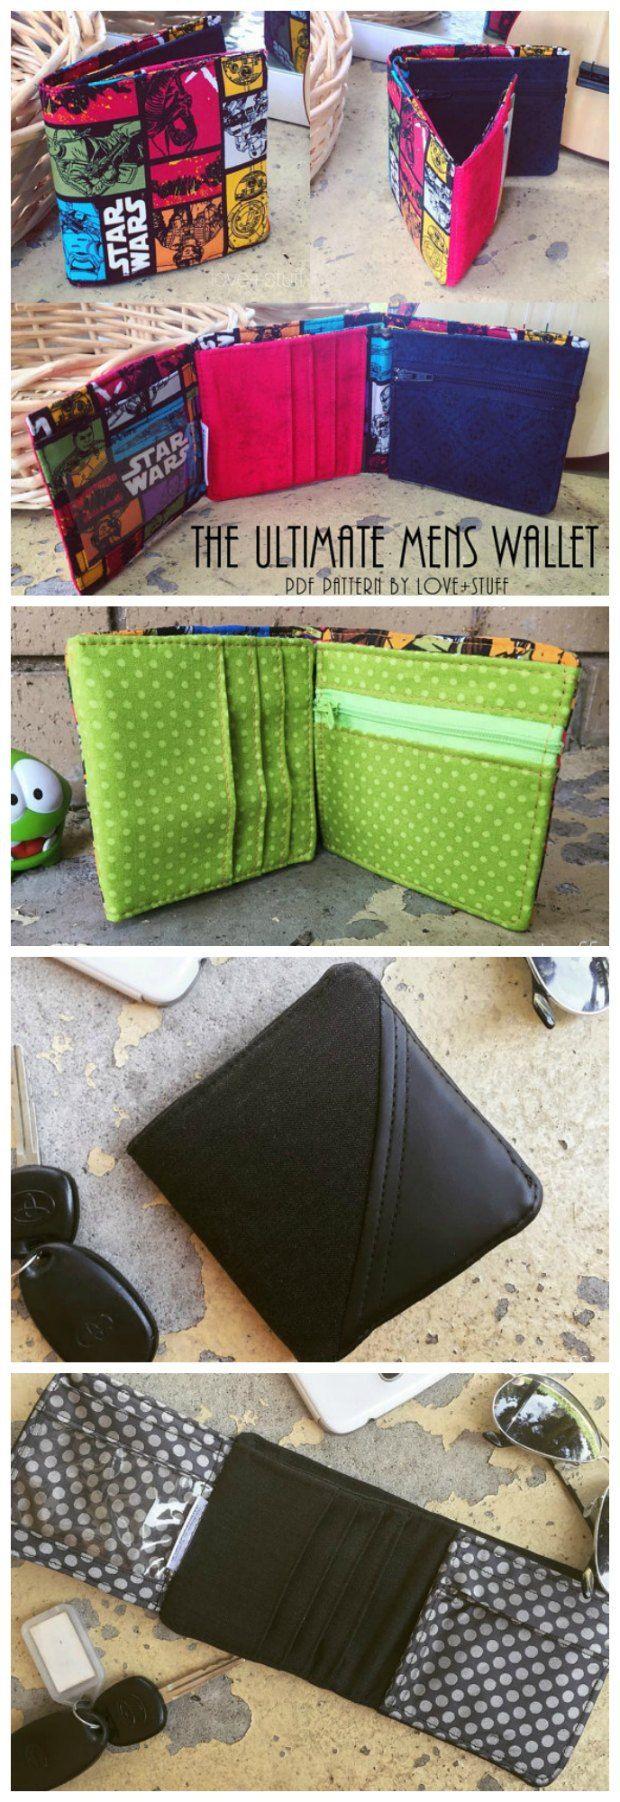 Ultimate Mens Wallet sewing pattern | Taschen nähen, Nähen und Diy nähen